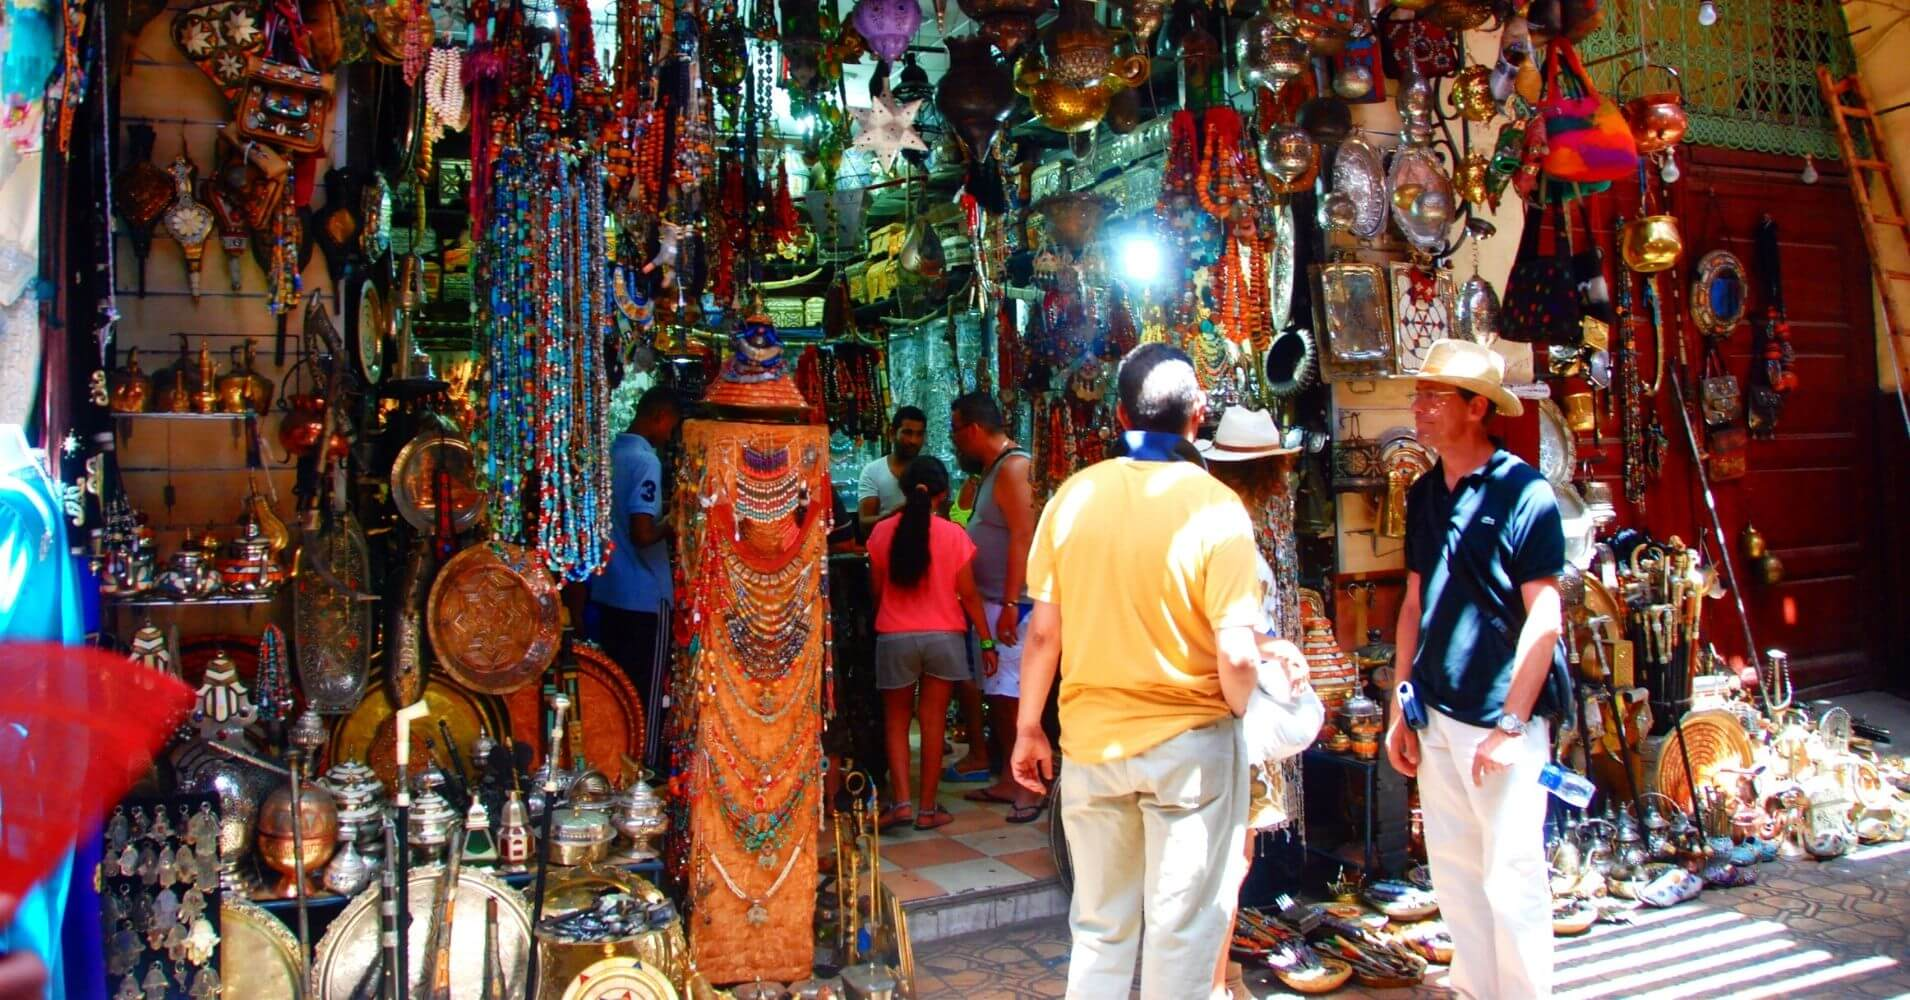 Bazar de la Medina de Marrakech, Marruecos.